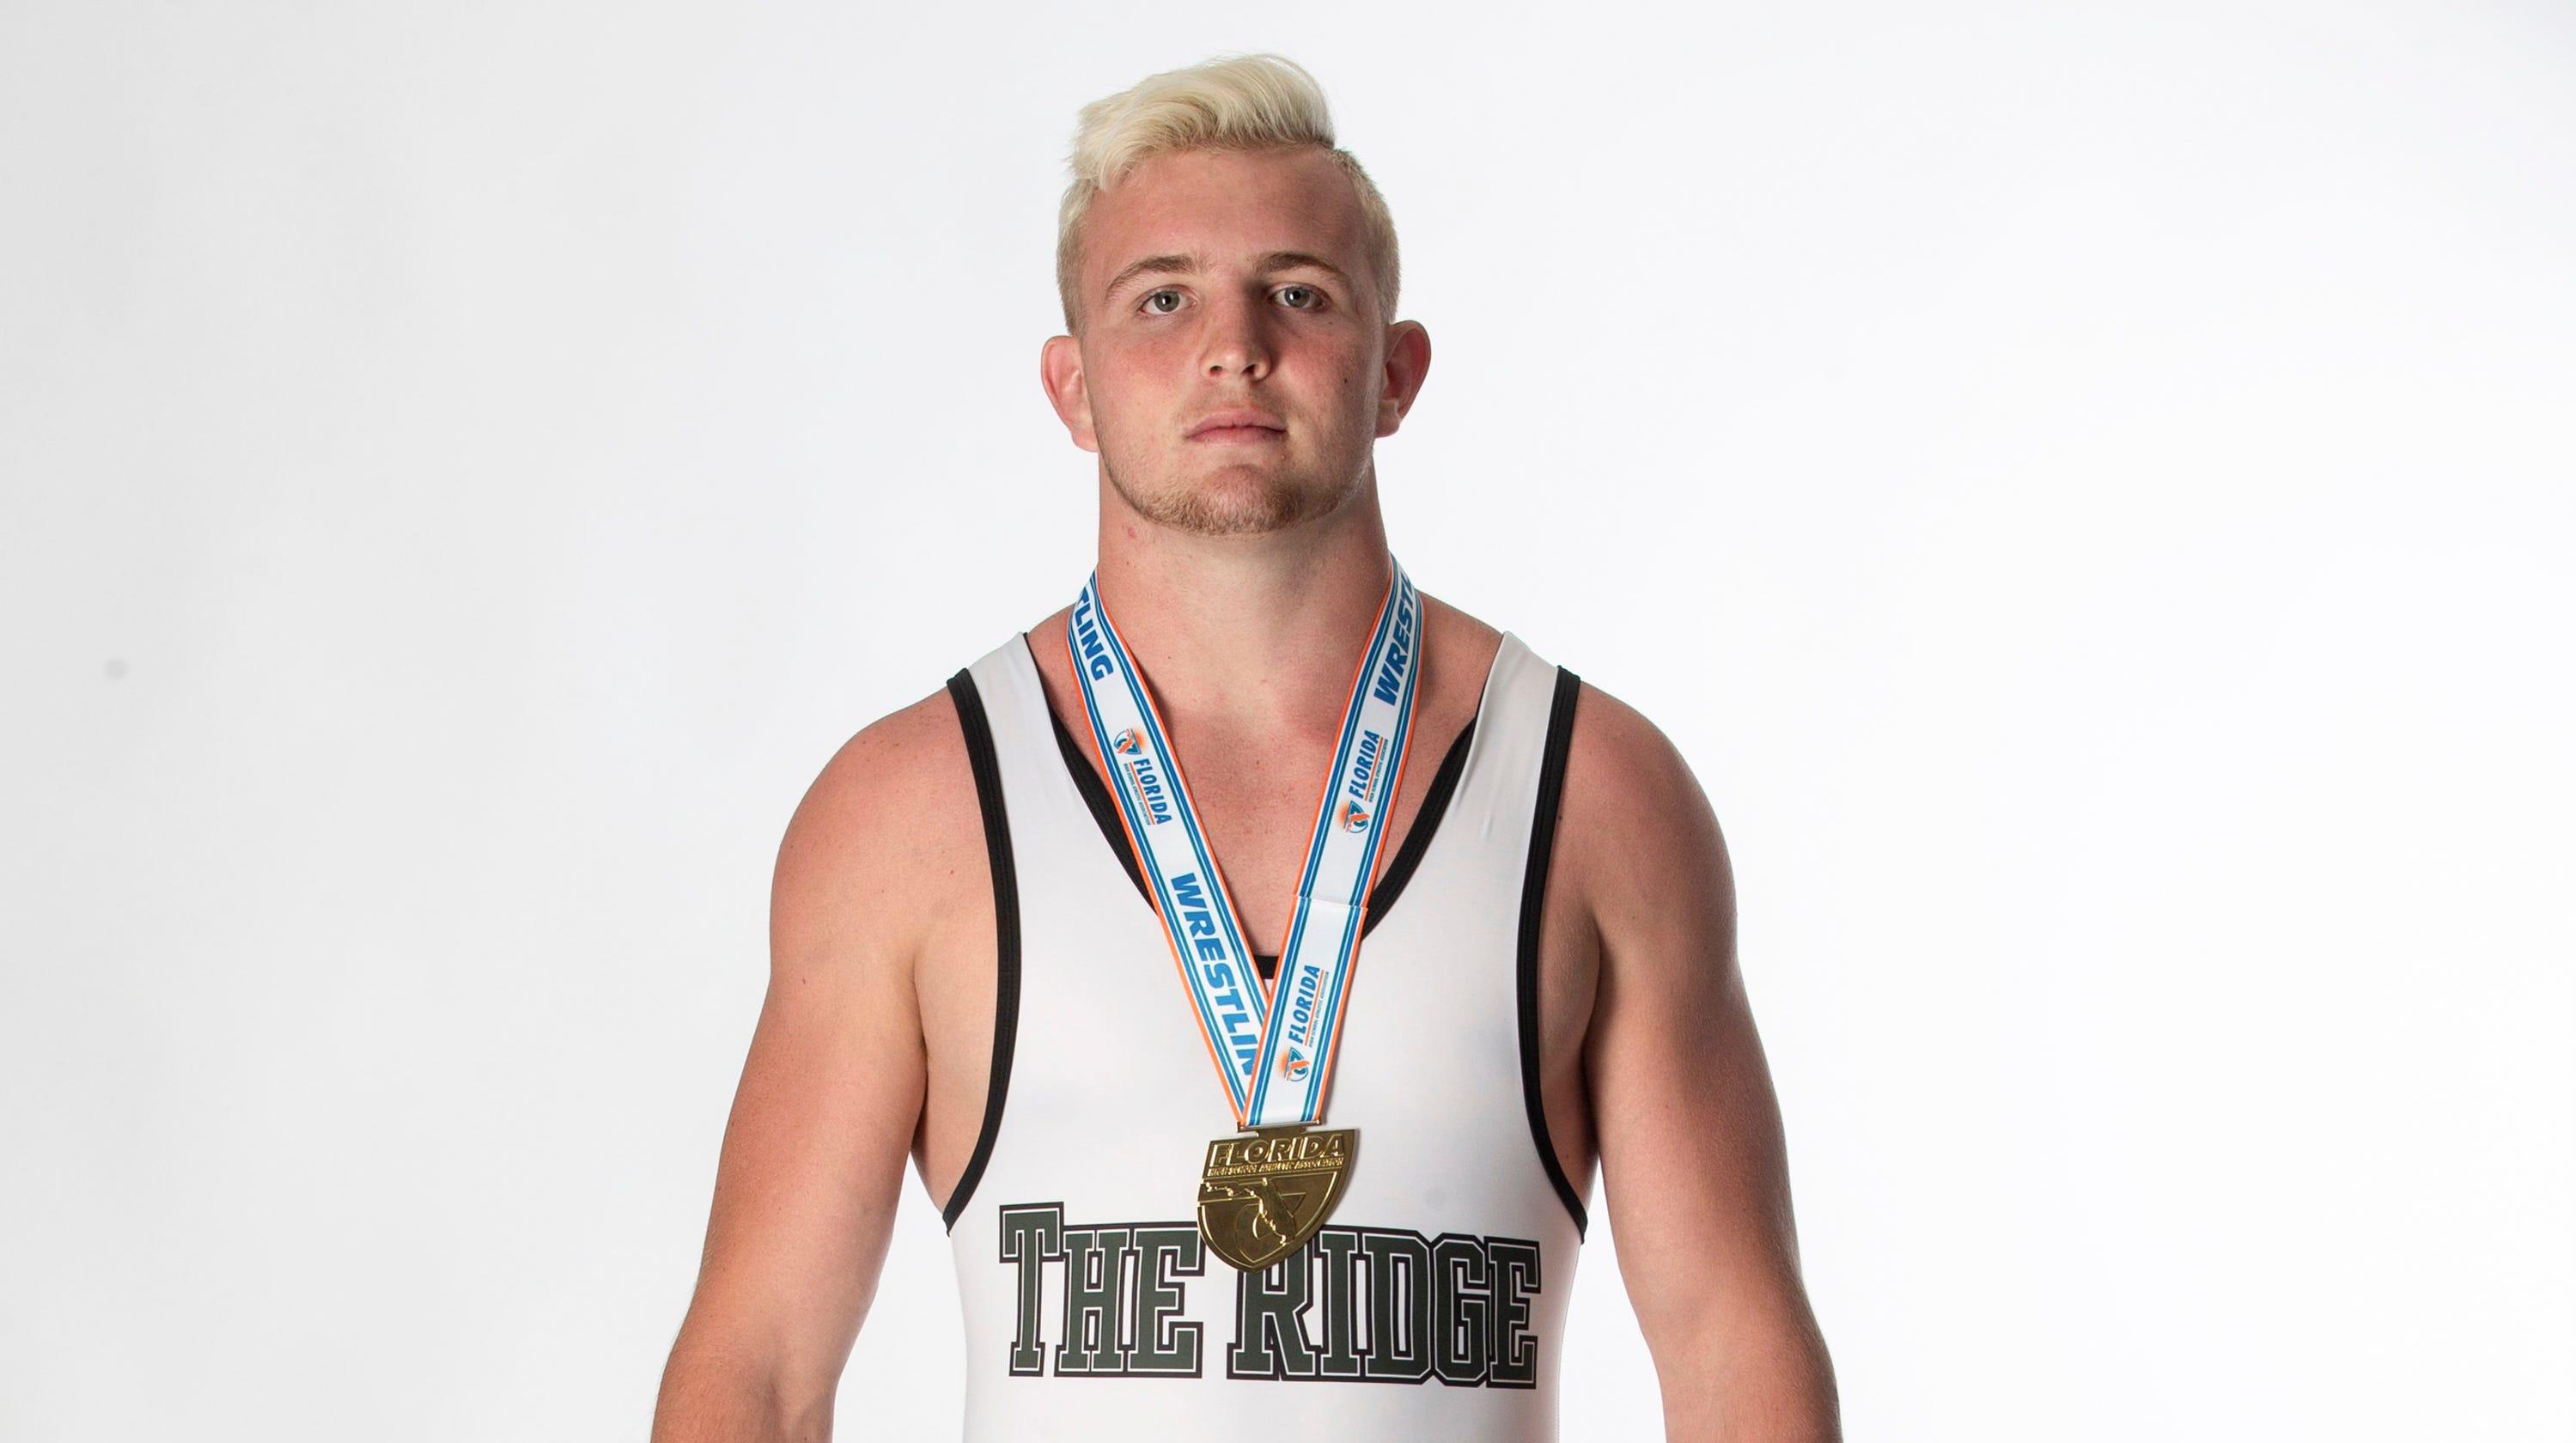 Palmetto Ridge star athlete Colby Singletary dies in car crash